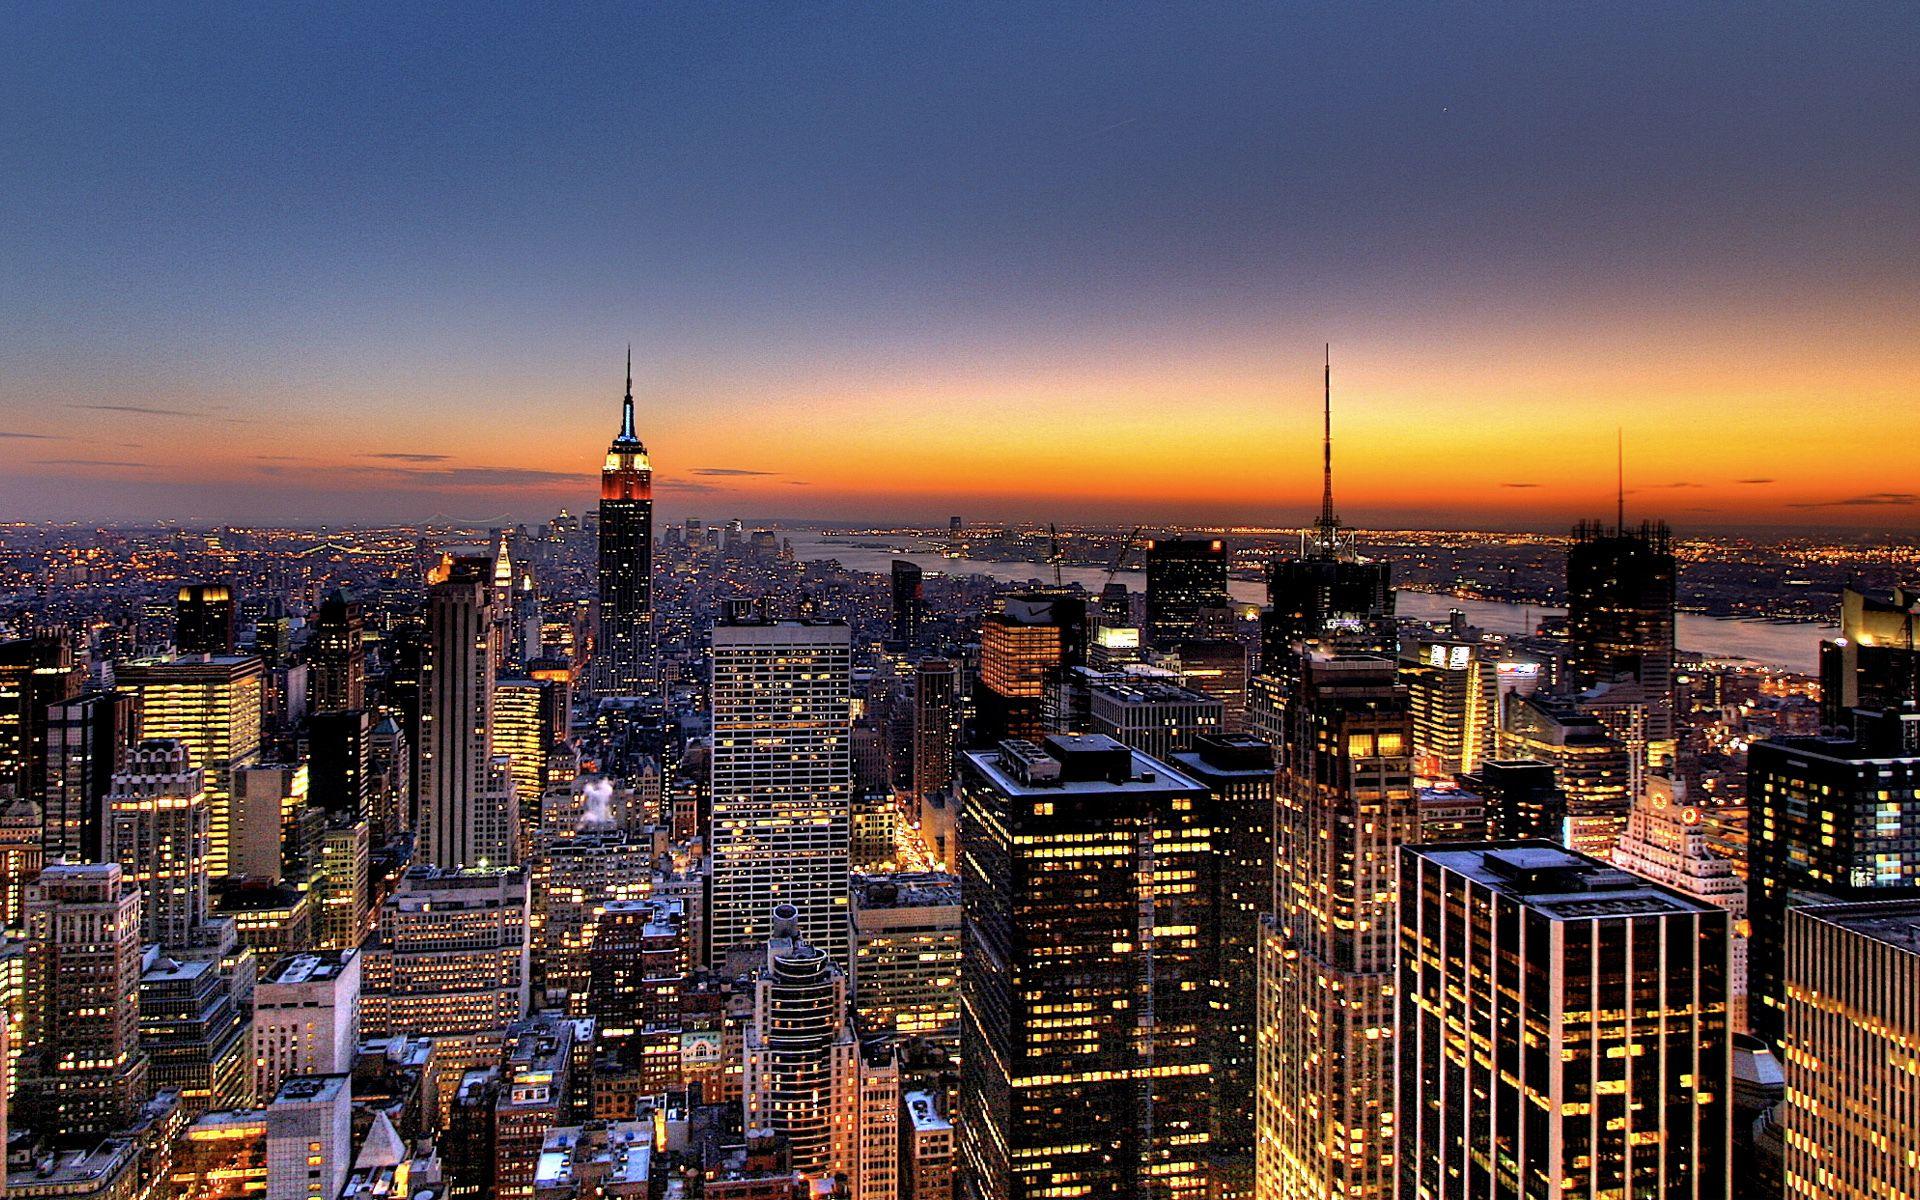 New York City Skyline At Night City Lights At Night City Wallpaper New York Night